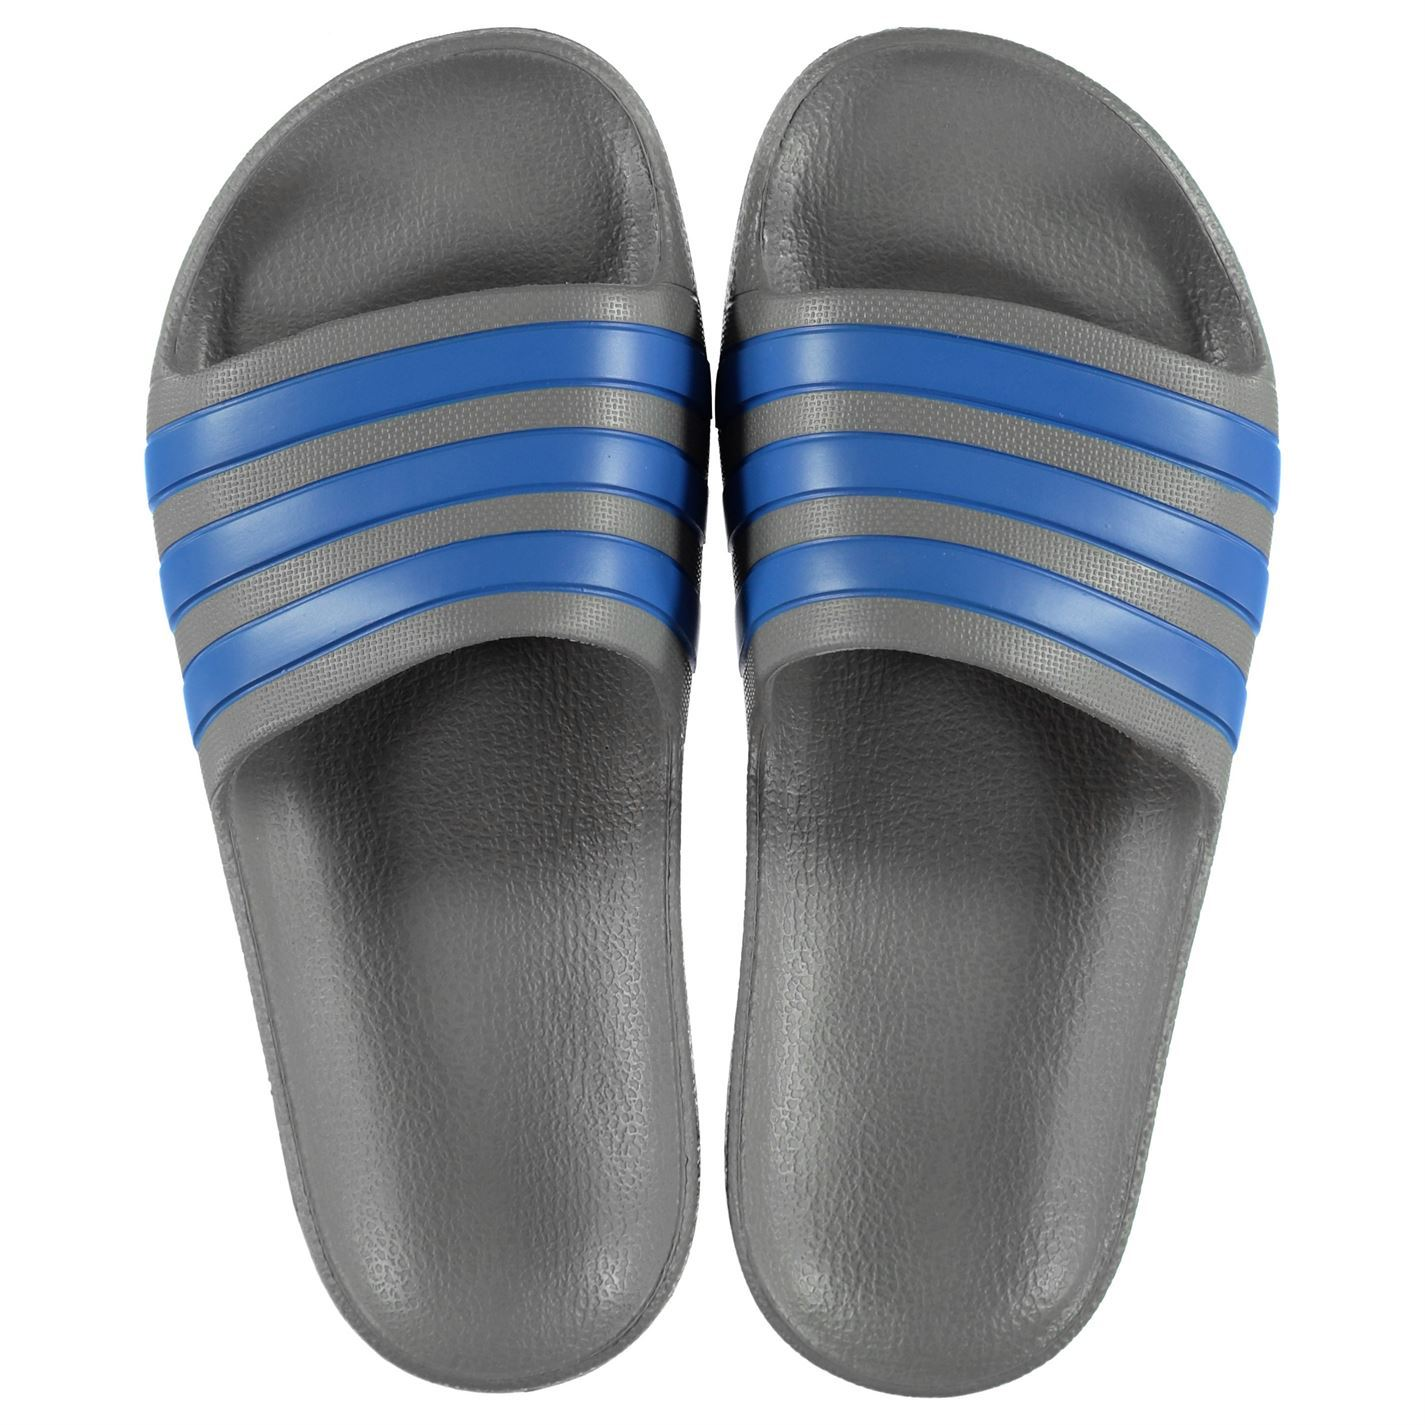 miniatura 19 - ADIDAS-Duramo-Slide-Piscina-Scarpe-Bambino-Ragazzo-Sandali-Infradito-Spiaggia-Scarpe-Thongs